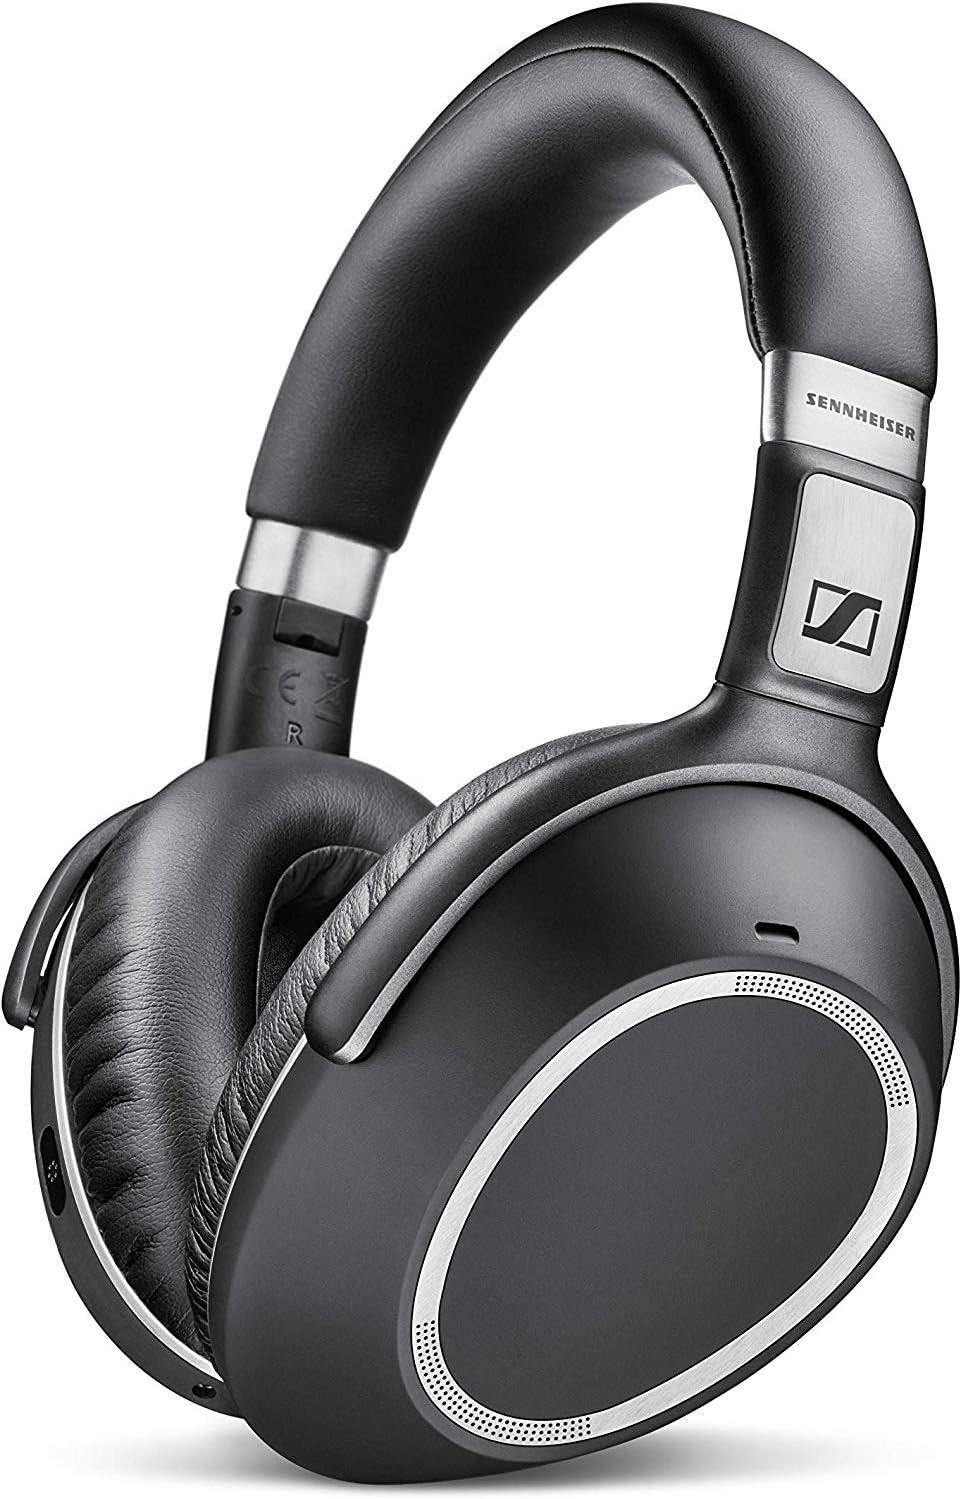 Sennheiser PXC550 - Auriculares de Diadema Cerrados con cancelación de Ruido adaptativo, Bluetooth, Color Negro